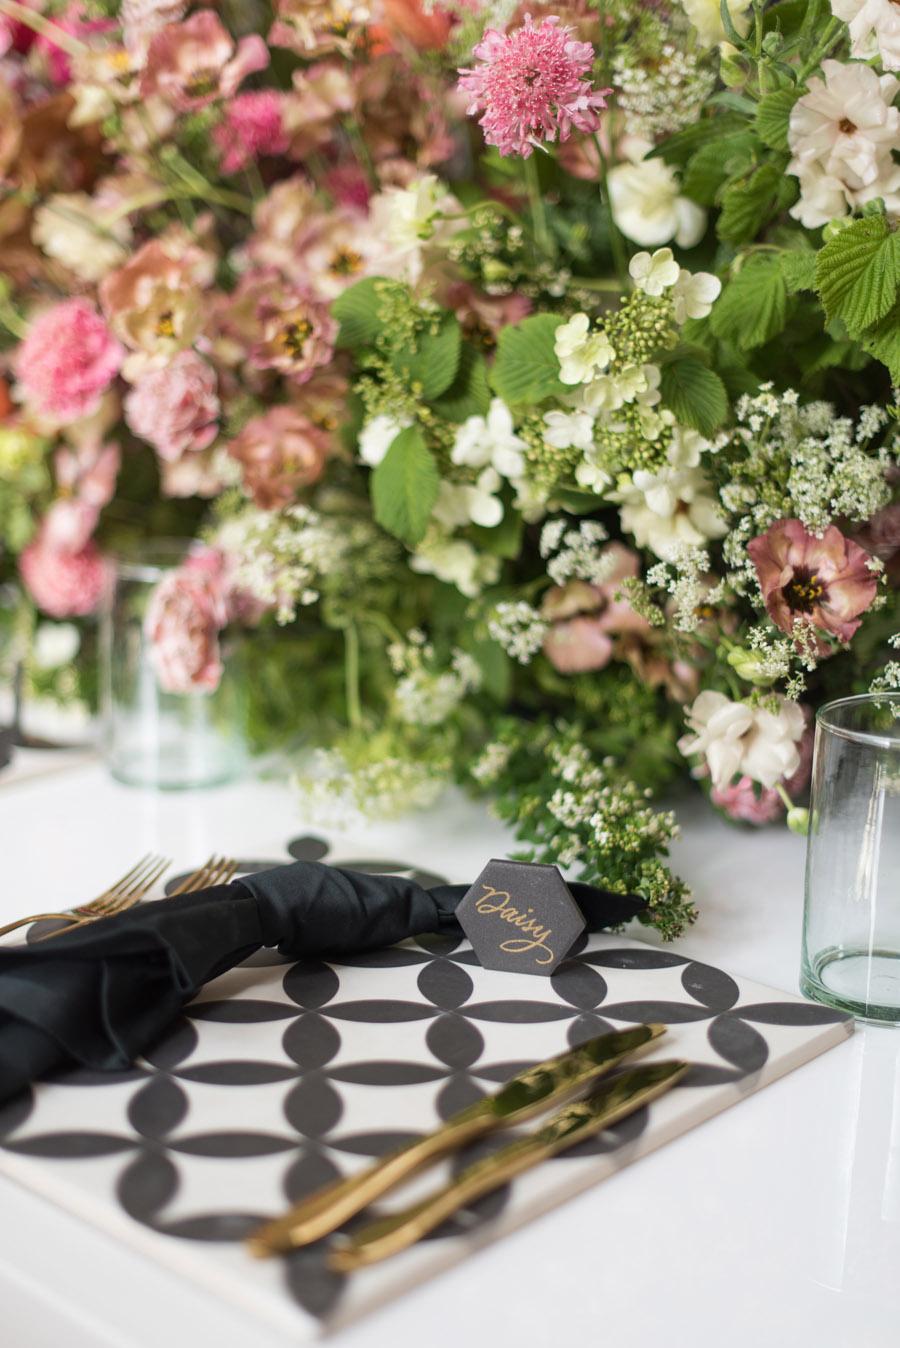 floral wedding ideas at Millbridge Court on English Wedding - photo credit Julie Michaelsen Photography (48)